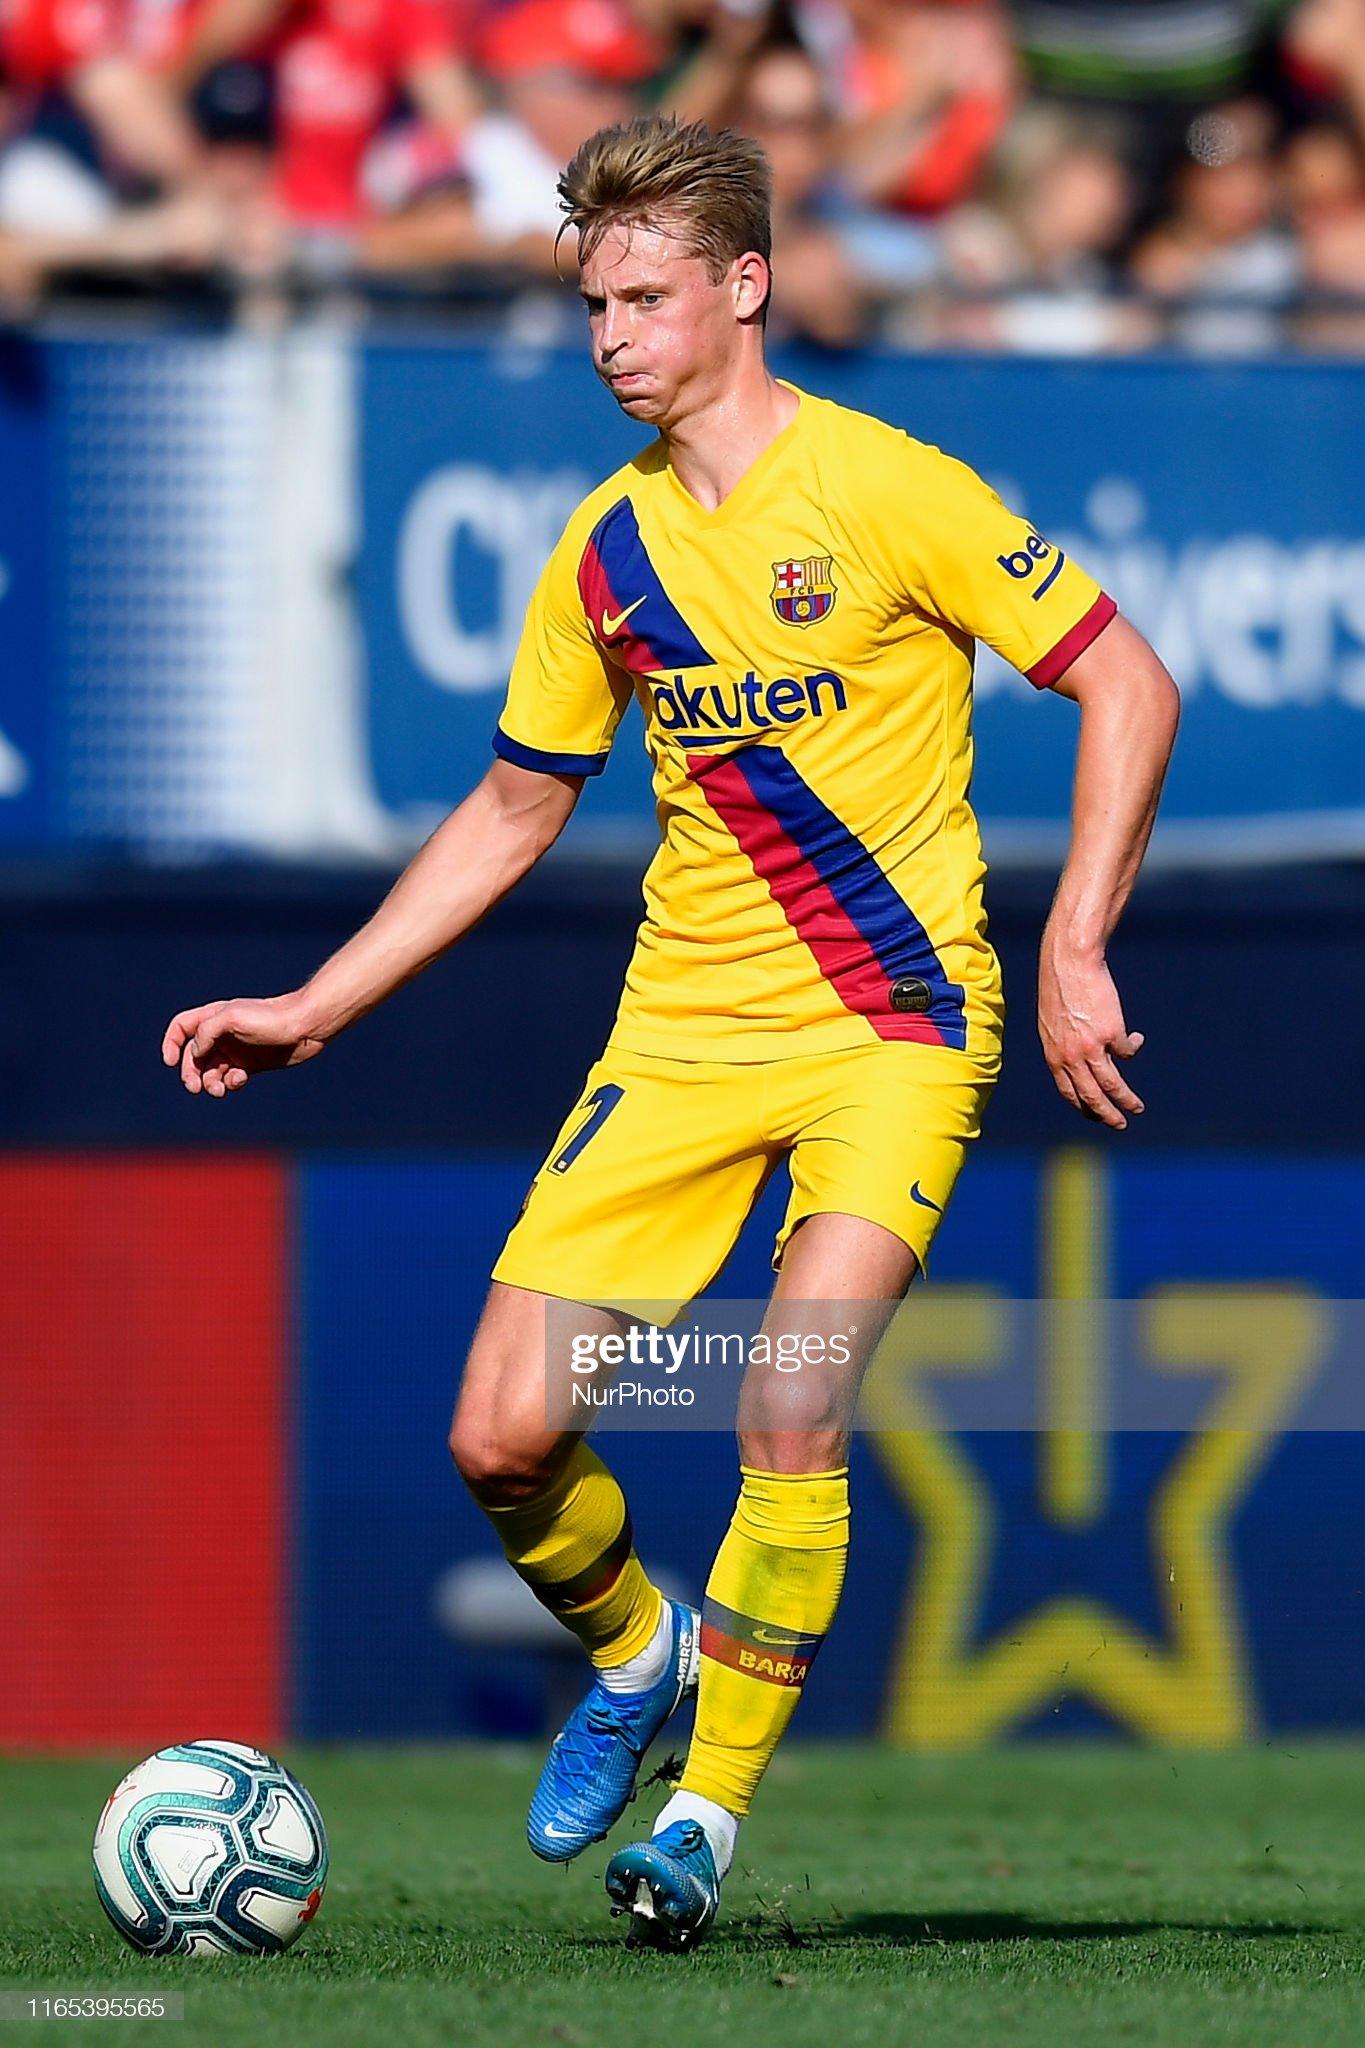 صور مباراة : أوساسونا - برشلونة 2-2 ( 31-08-2019 )  Frenkie-de-jong-of-barcelona-in-action-during-the-liga-match-between-picture-id1165395565?s=2048x2048